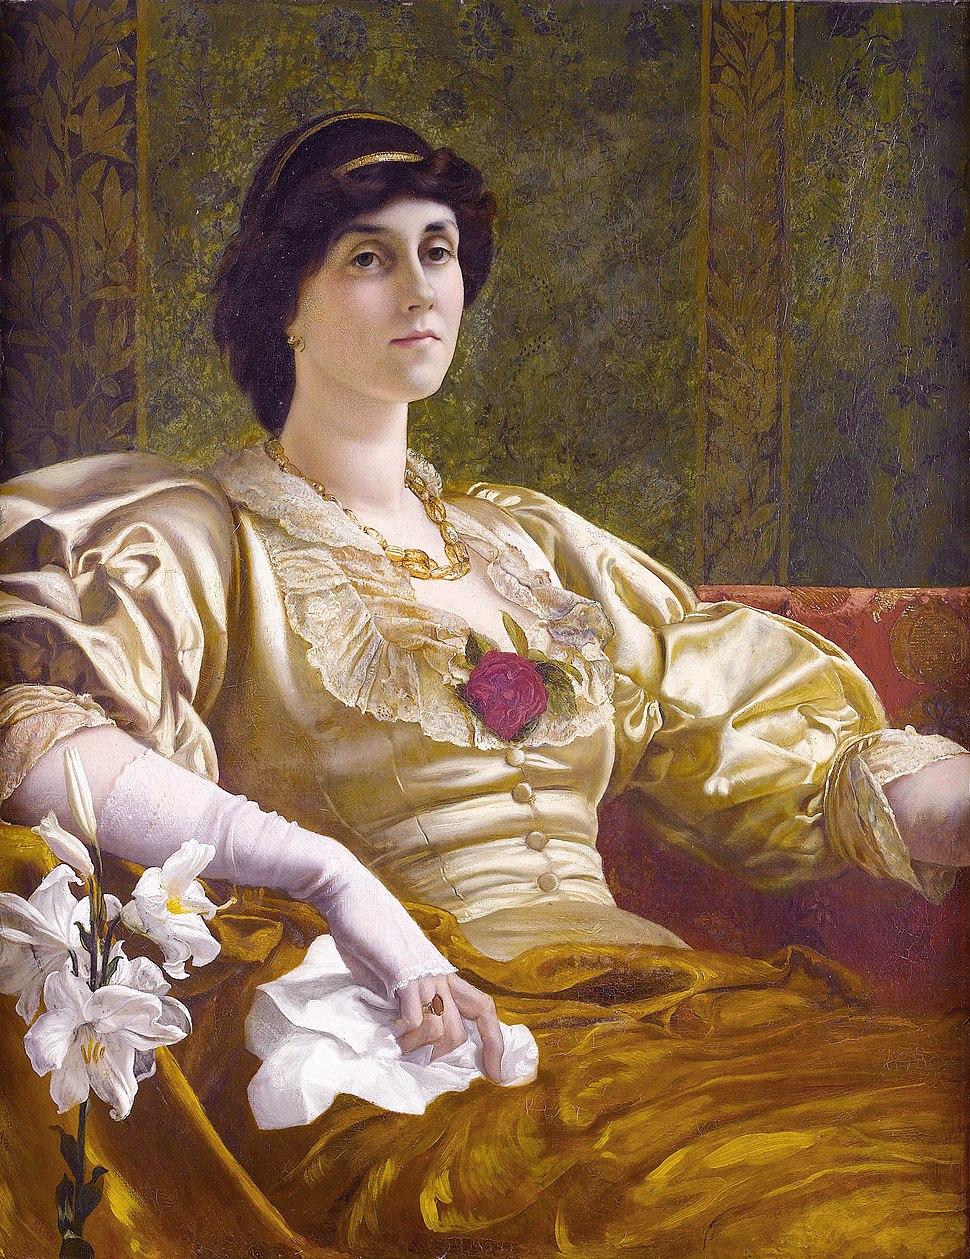 Ethel Bertha Harrison (1851-1916), by William Blake Richmond